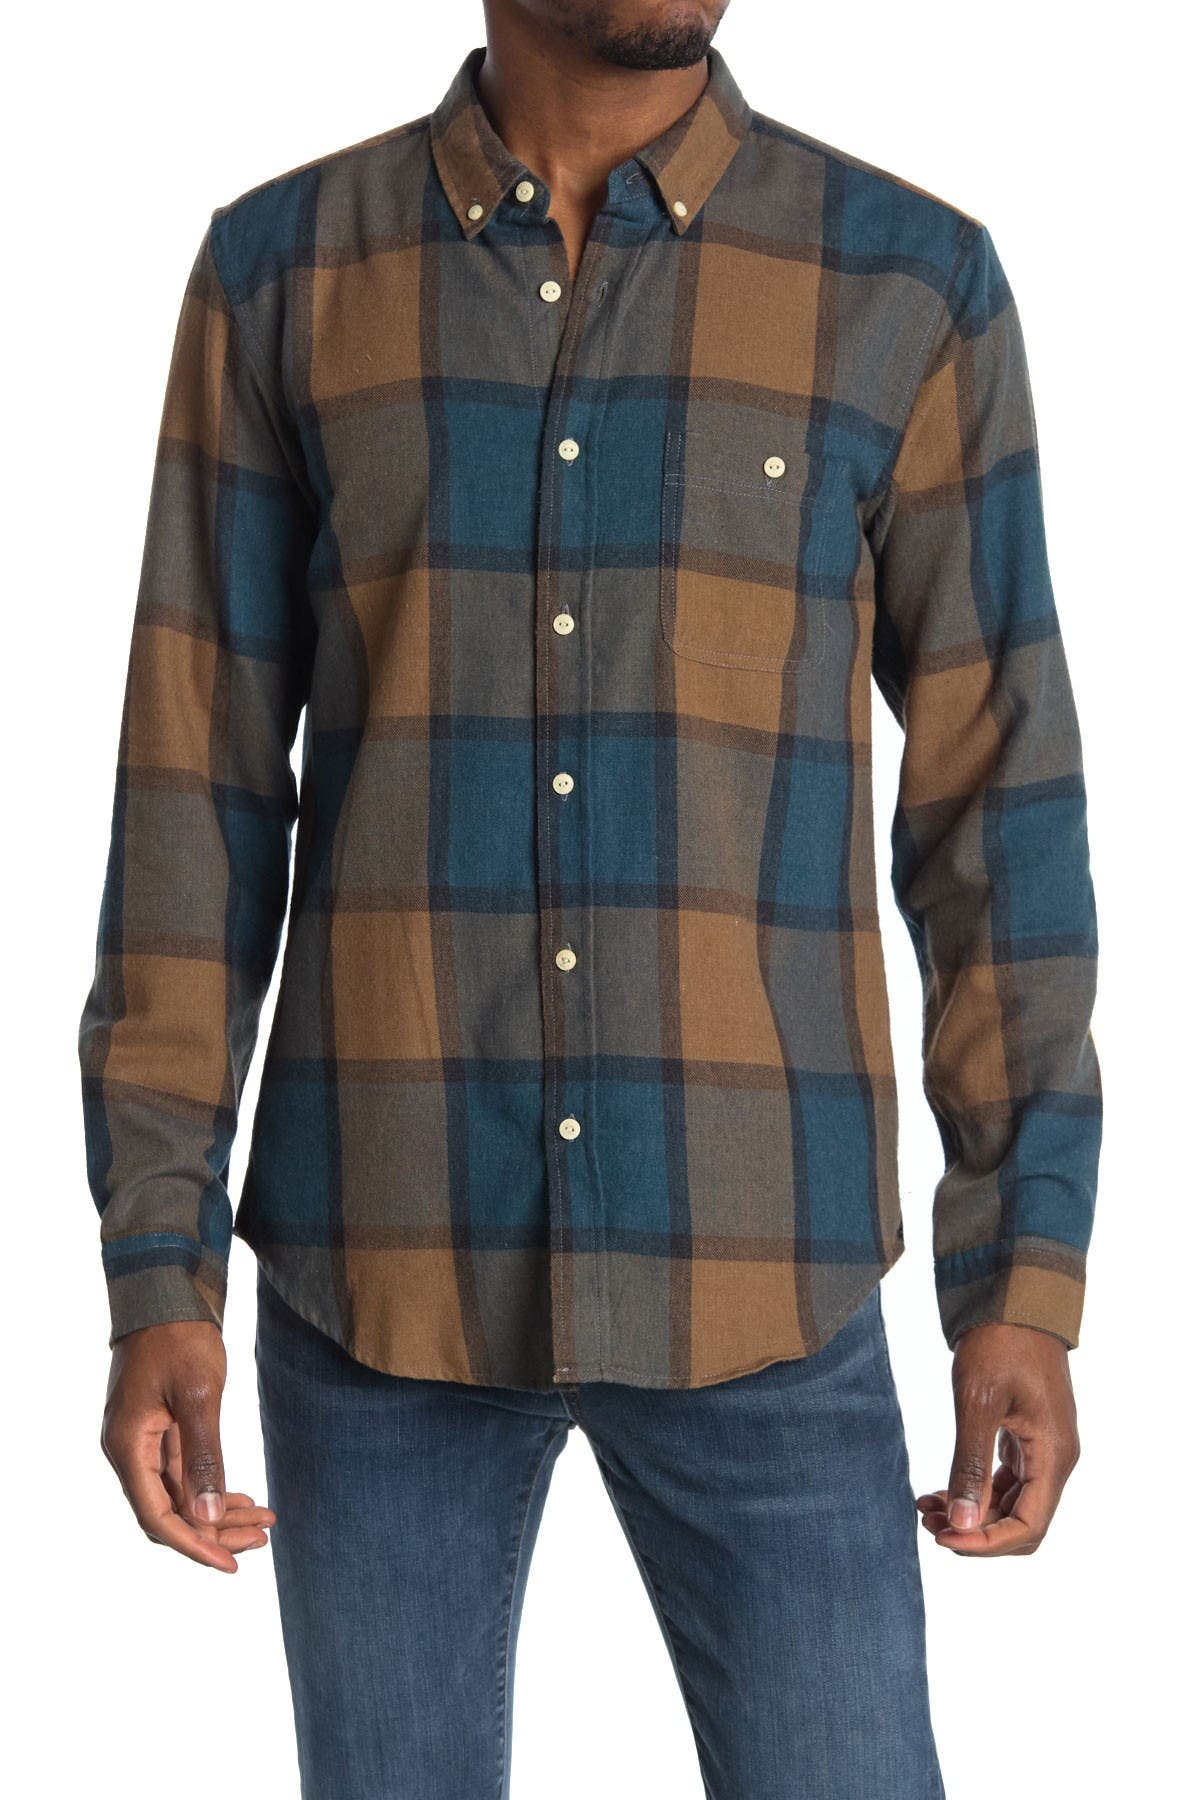 Image of Ezekiel Deuce Long Sleeve Woven Dress Shirt